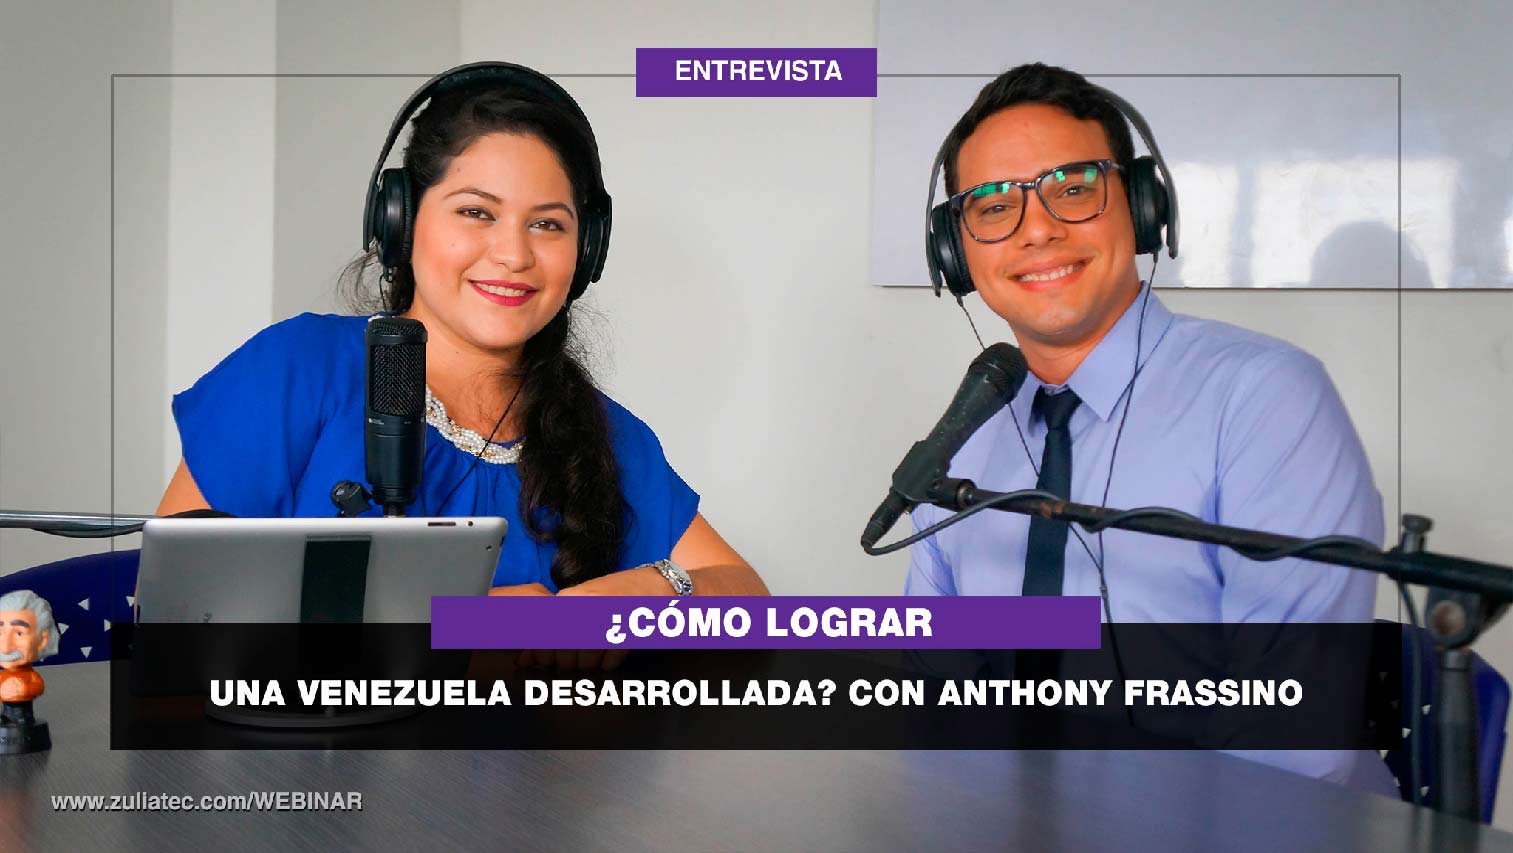 Lograr-una-venezuela-desarrollada-anthony-frassino-zuliatec